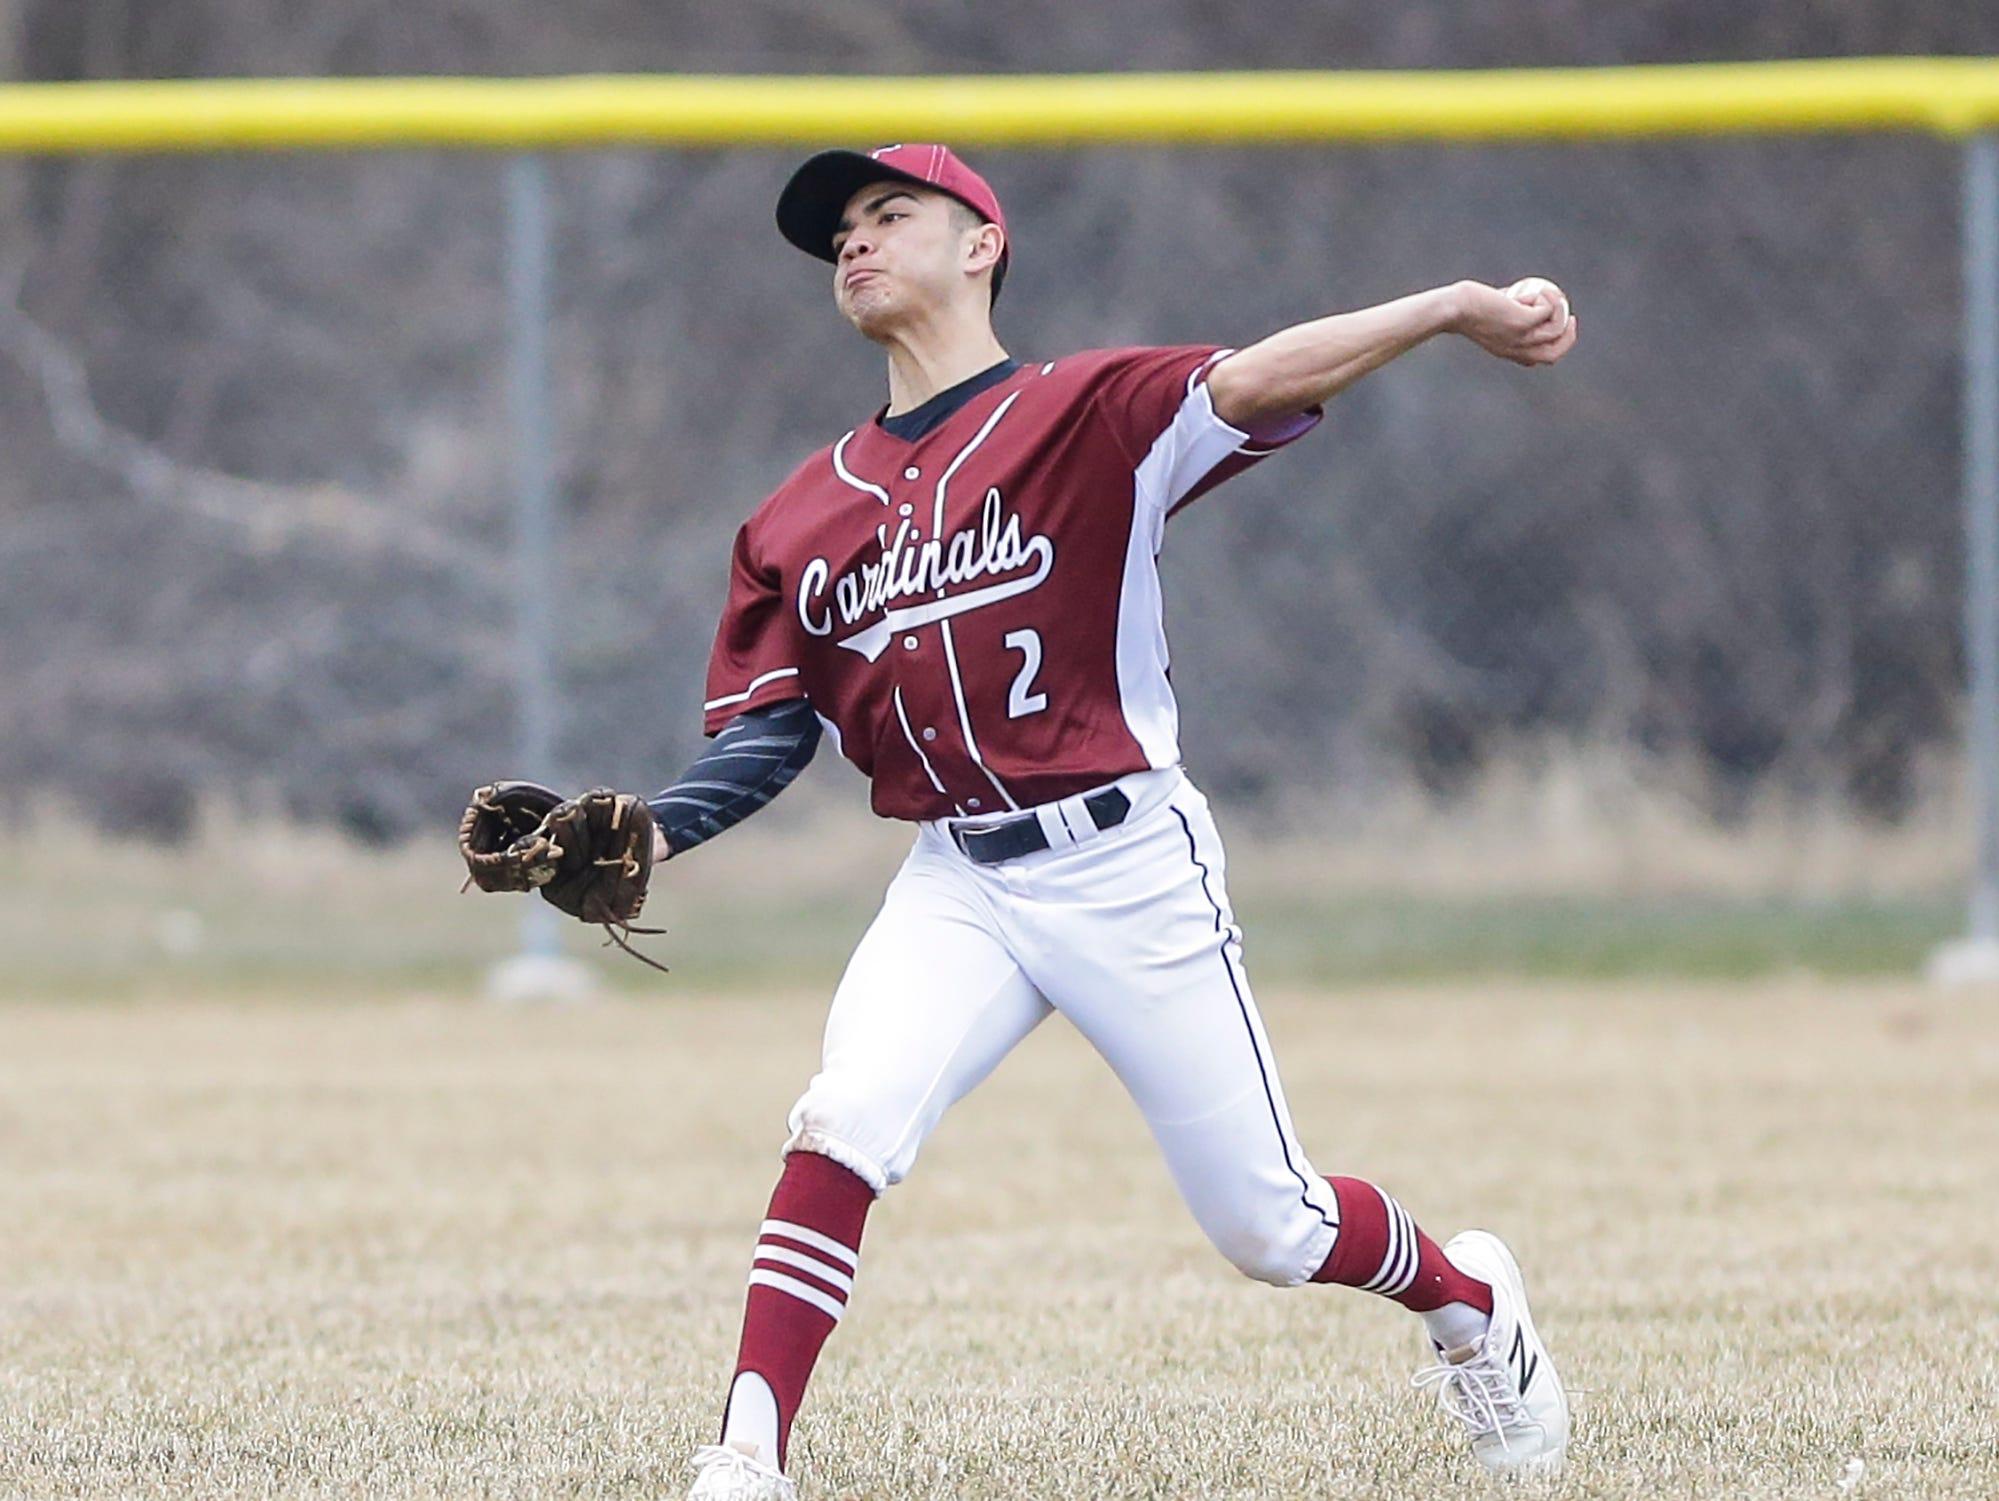 Fond du Lac High School baseball's Julian Murillo fields a ball against Ashwaubenon High School Saturday, April 6, 2019 during their game in Fond du Lac, Wis. Fond du Lac won the game 5-3. Doug Raflik/USA TODAY NETWORK-Wisconsin